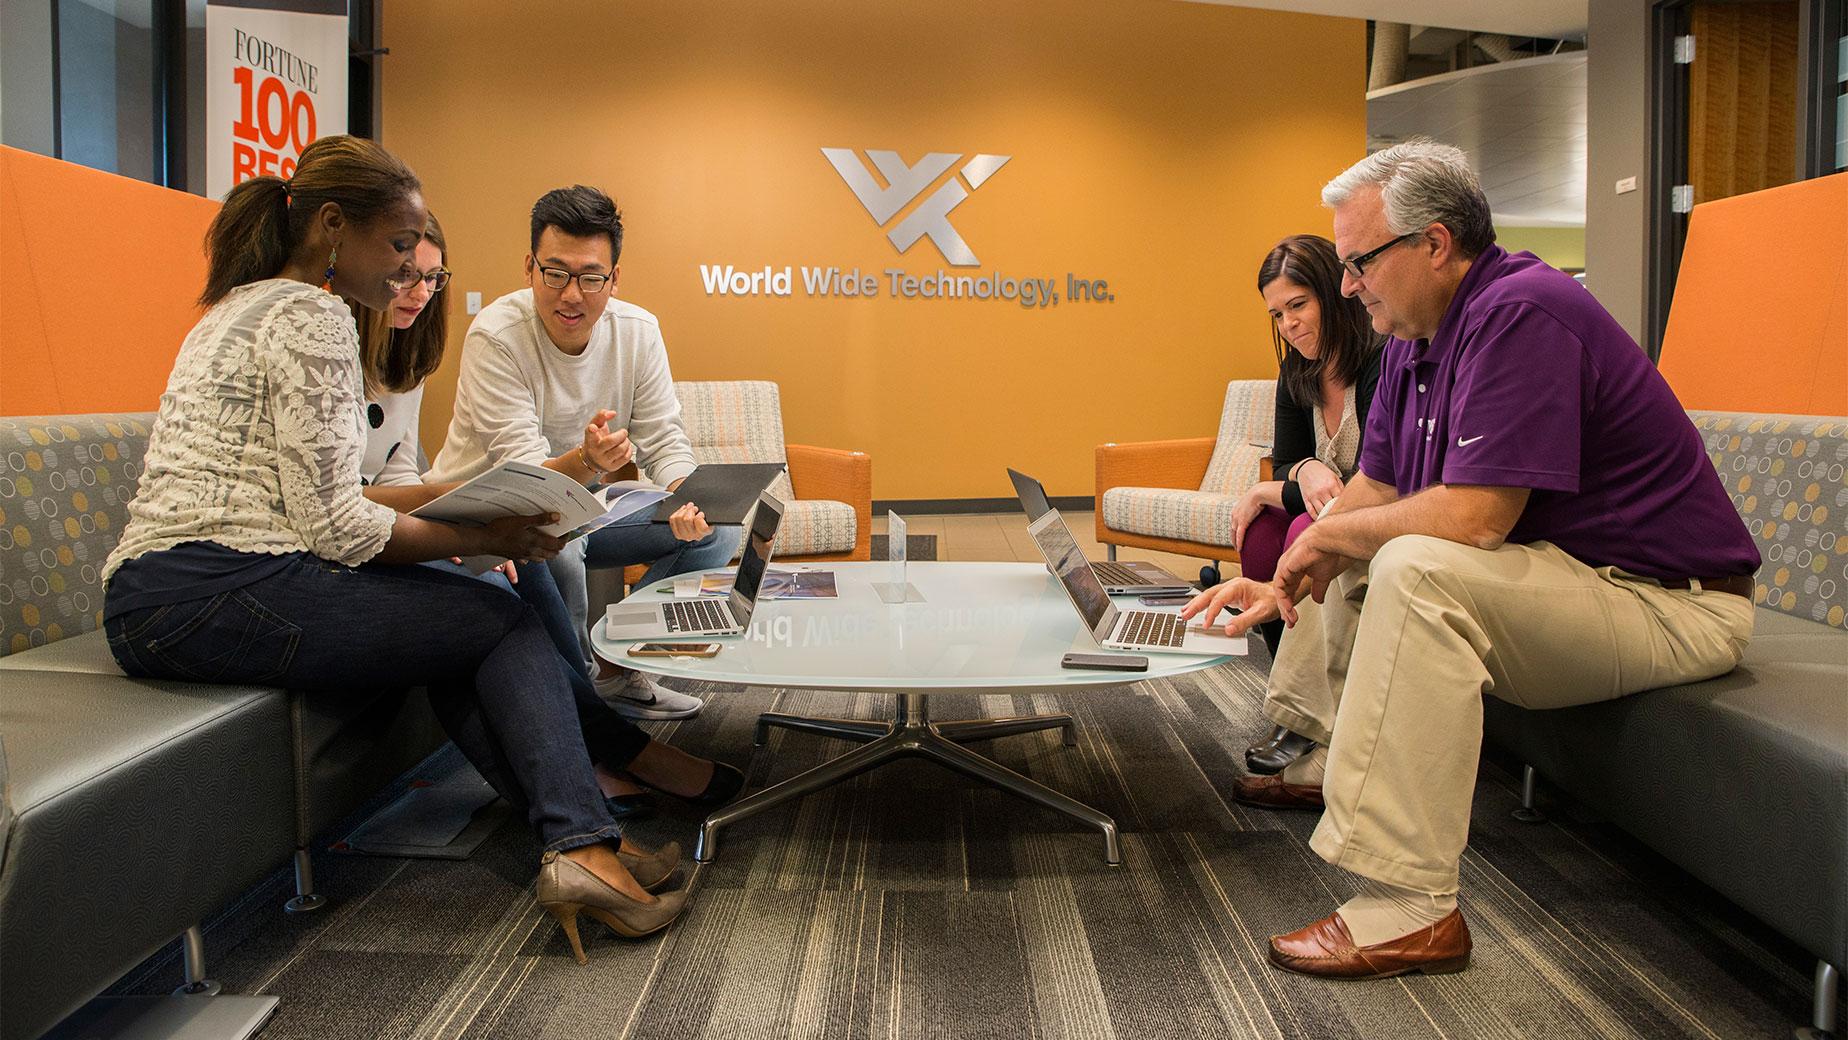 Best Workplace Tech World Wide Technology